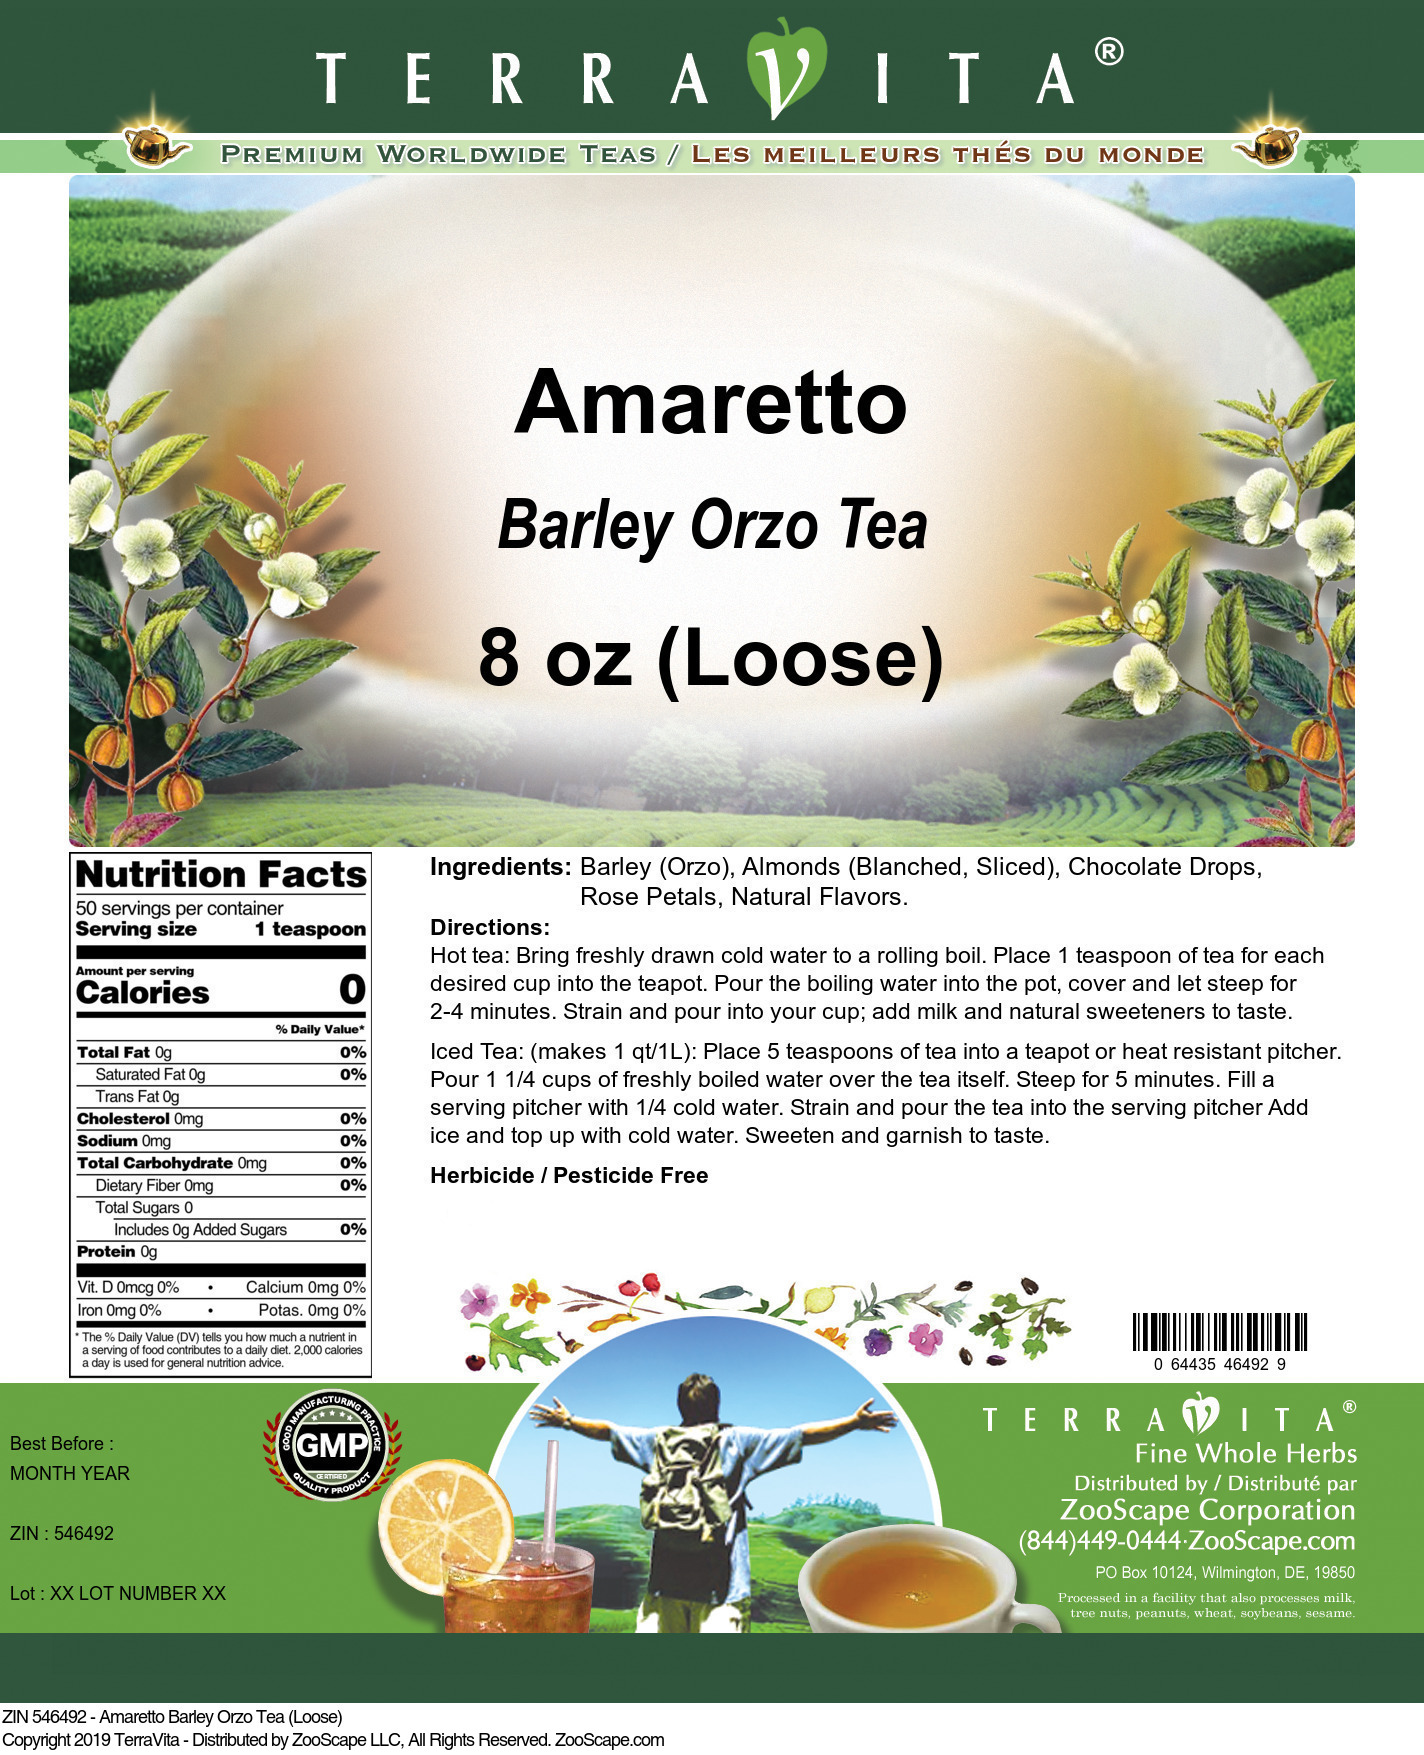 Amaretto Barley Orzo Tea (Loose)